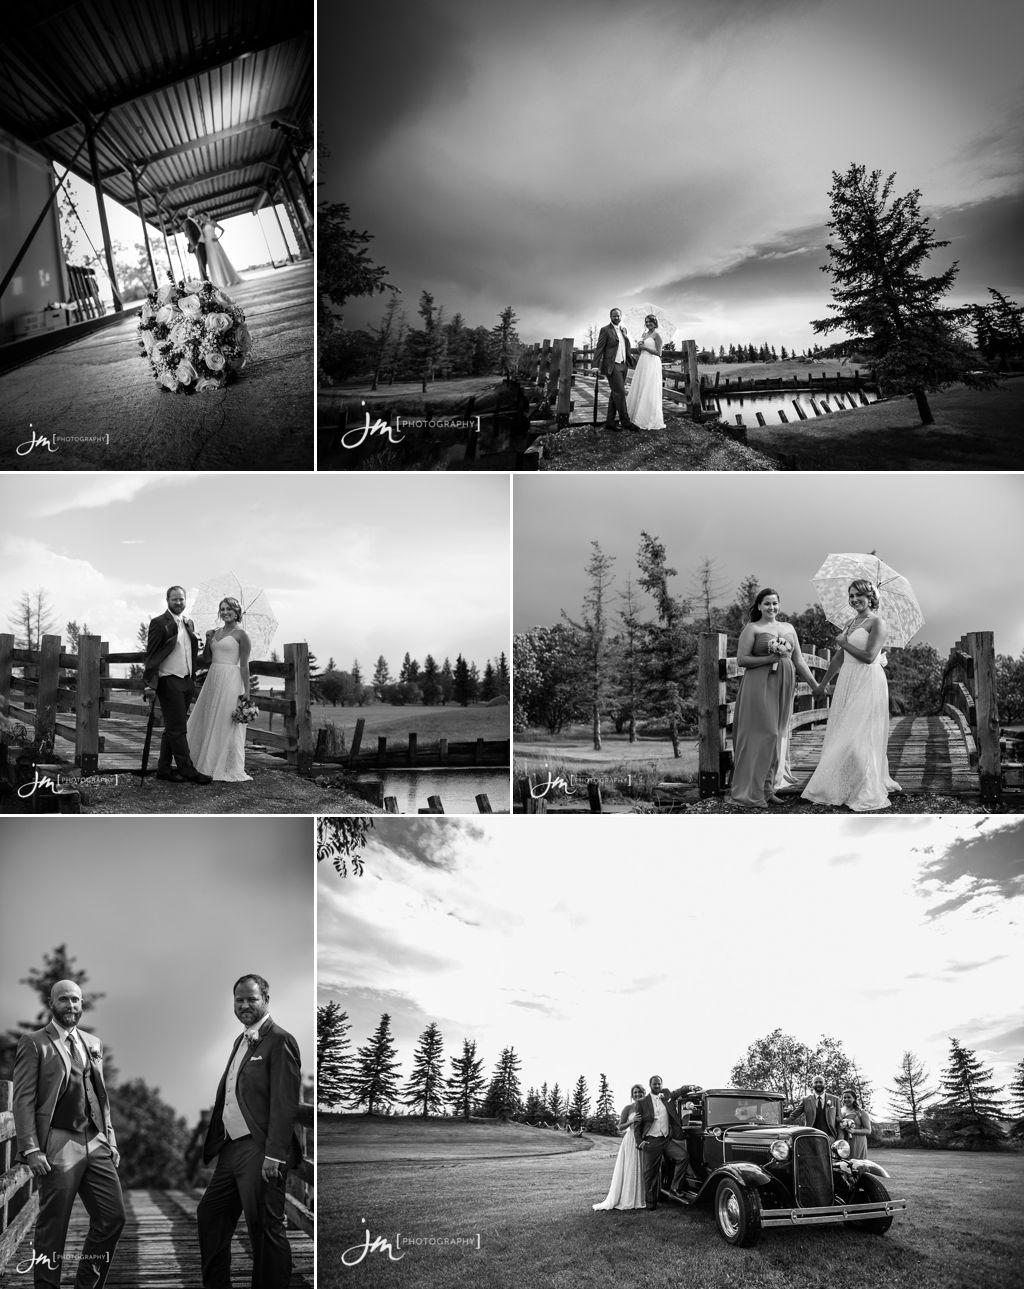 150620r_010 Edmonton-Wedding-Photographers-JM_Photography-Jeremy-Martel